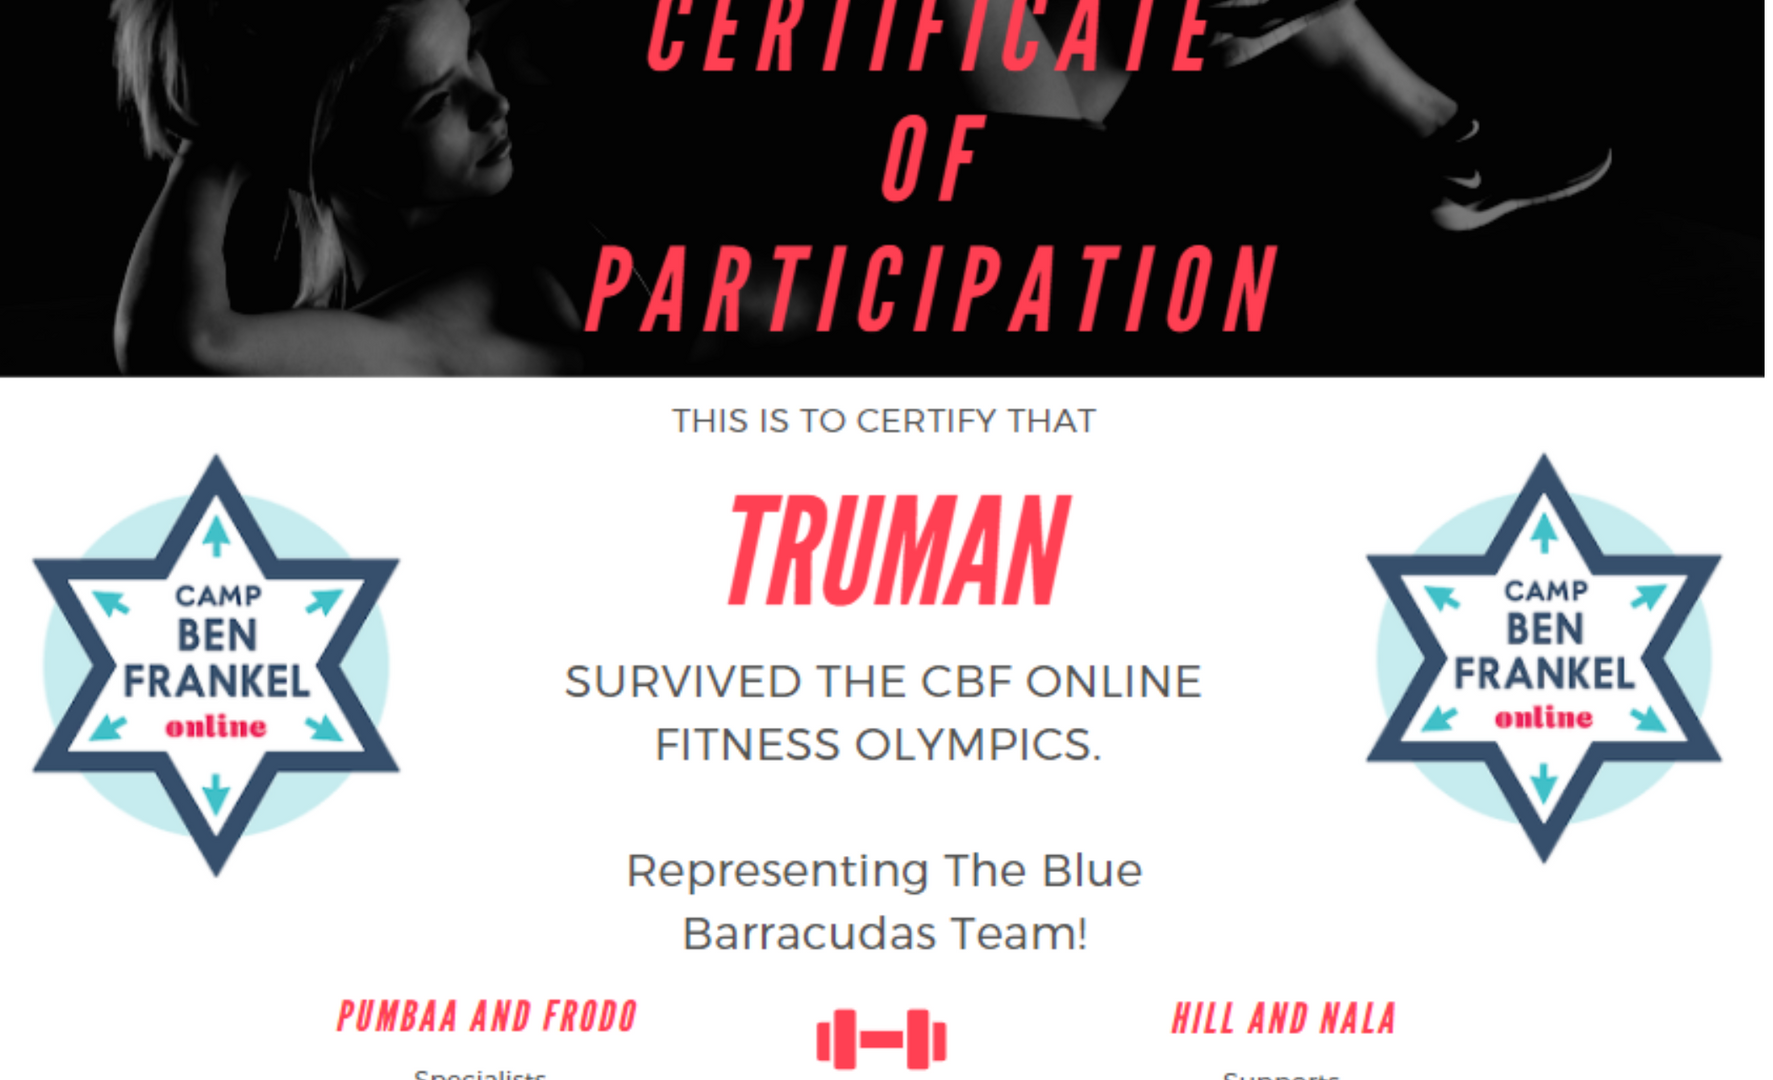 Truman's Certificate of Participation